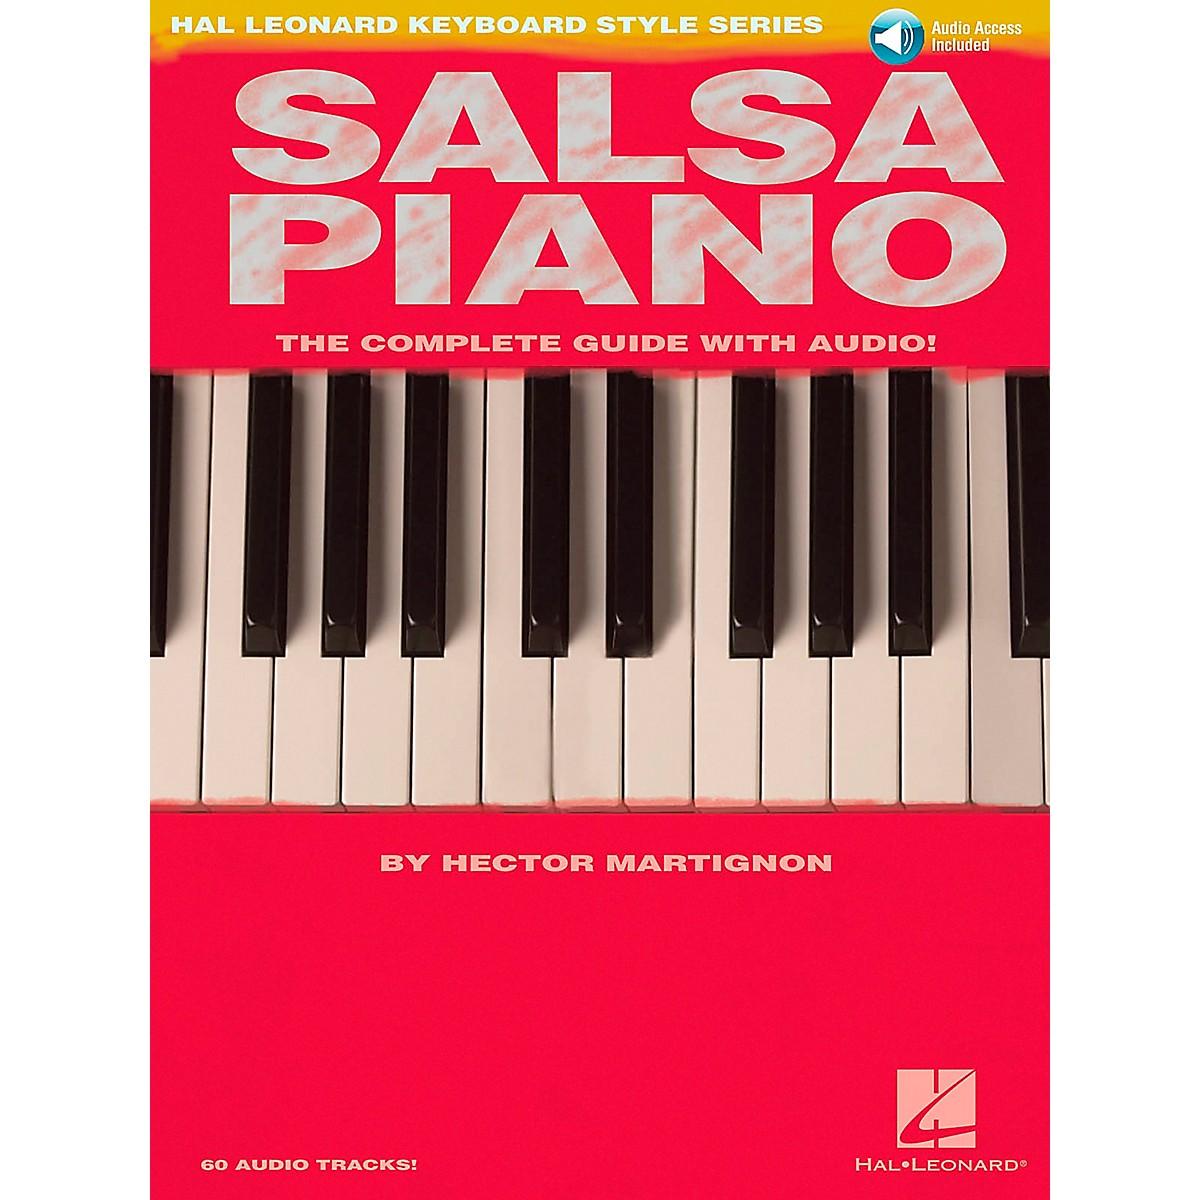 Hal Leonard Salsa Piano Book/CD Hal Leonard Keyboard Style Series